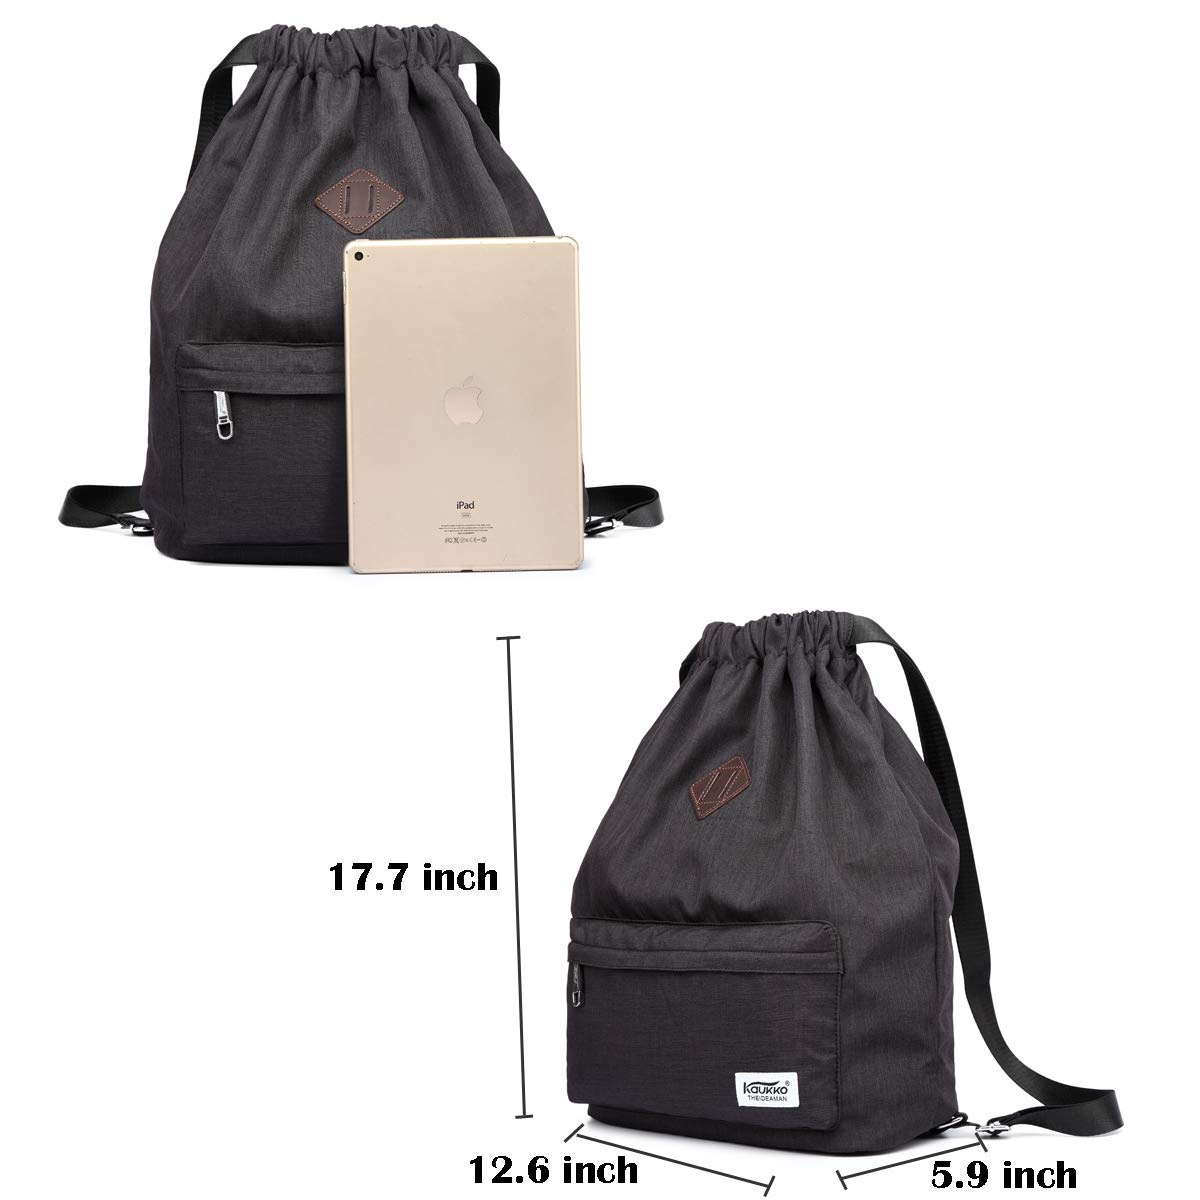 Drawstring Bags Black Drawstring Bags Sports Backpack Gym Yoga Sackpack Lightweight Shoulder Rucksack for Men and Women